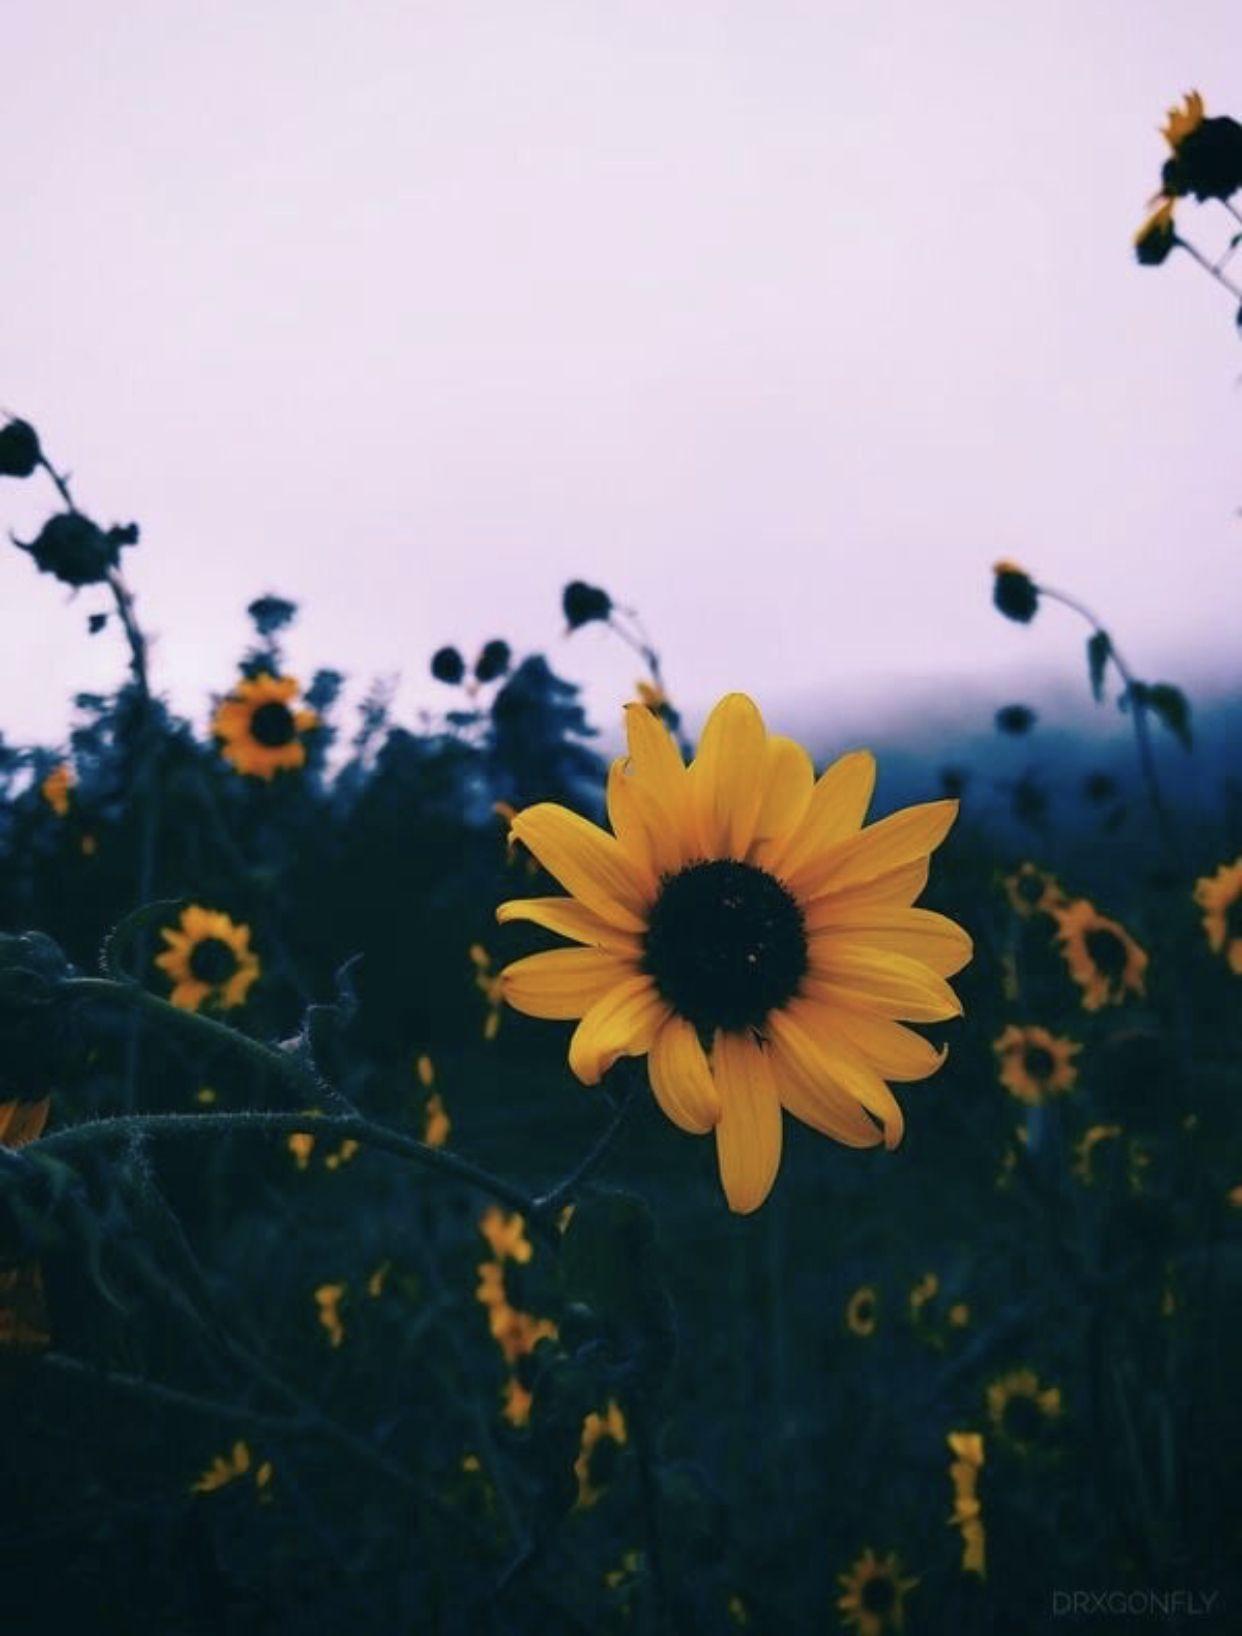 Pin By Emily Orzehoski On Vsco Wall Ideas Aesthetic Photography Flower Aesthetic Sunflower Wallpaper